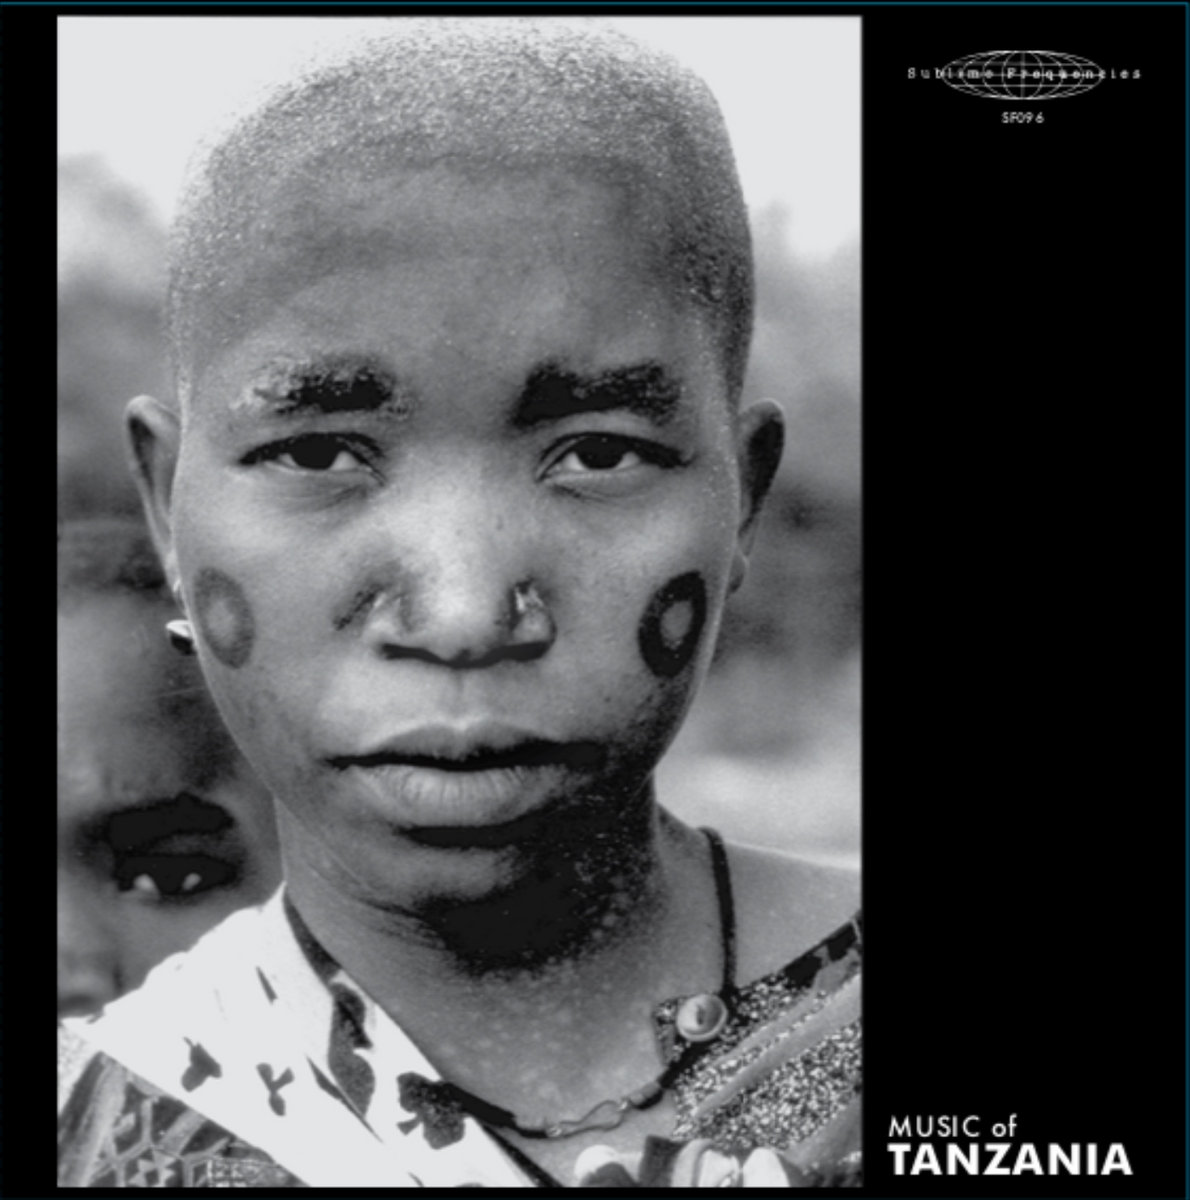 MUSIC OF TANZANIA | kinkgong